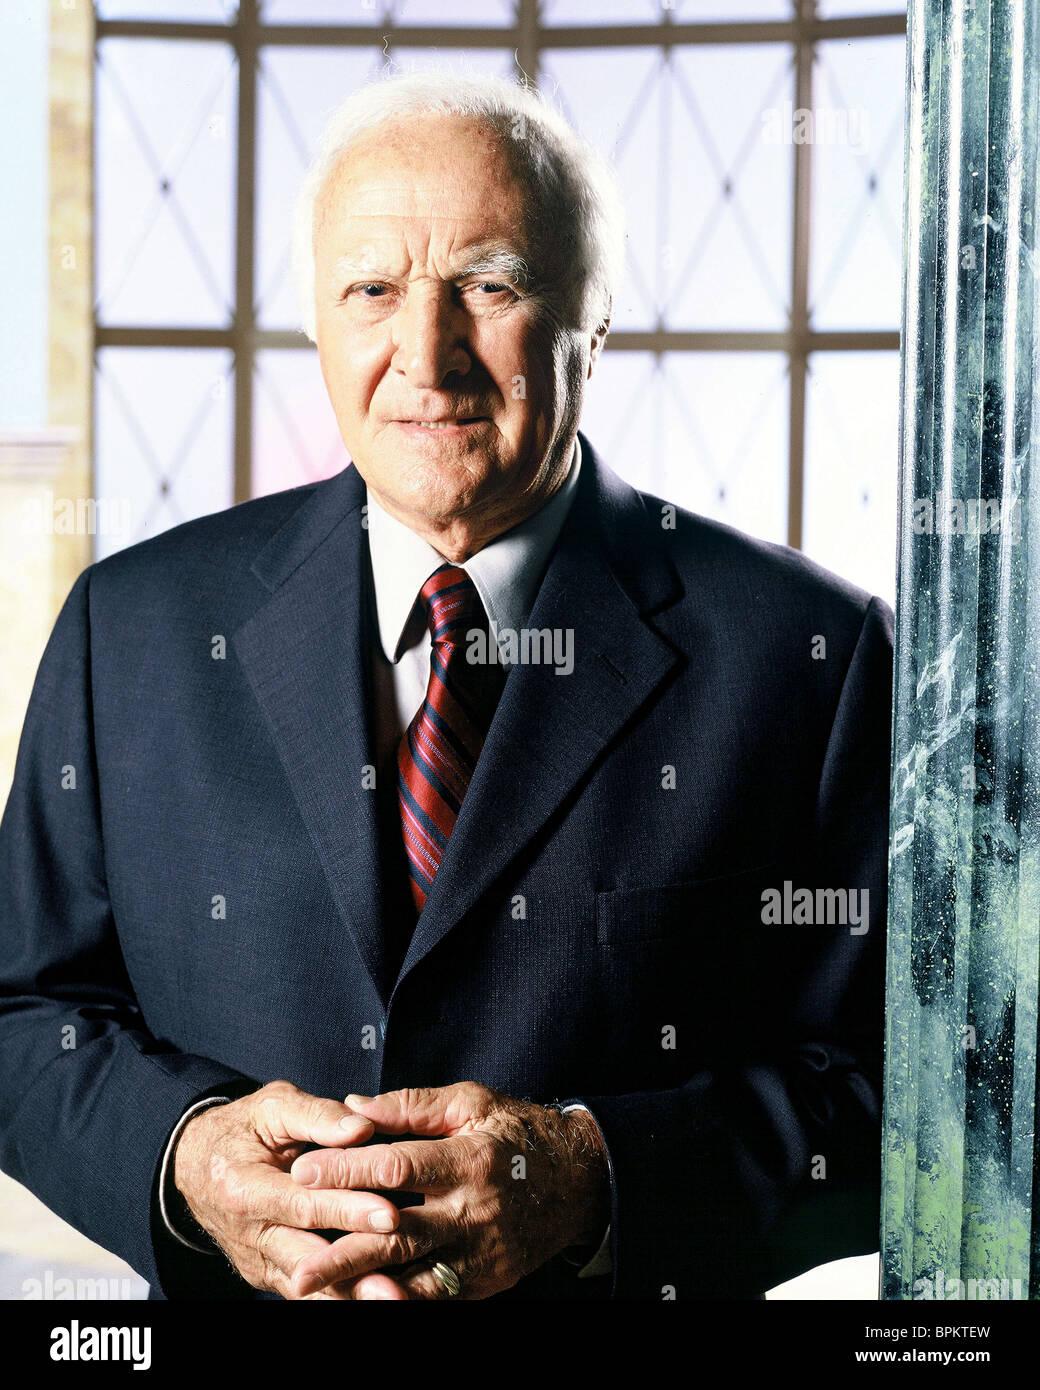 ROBERT LOGGIA QUEENS SUPREME (2003) - Stock Image